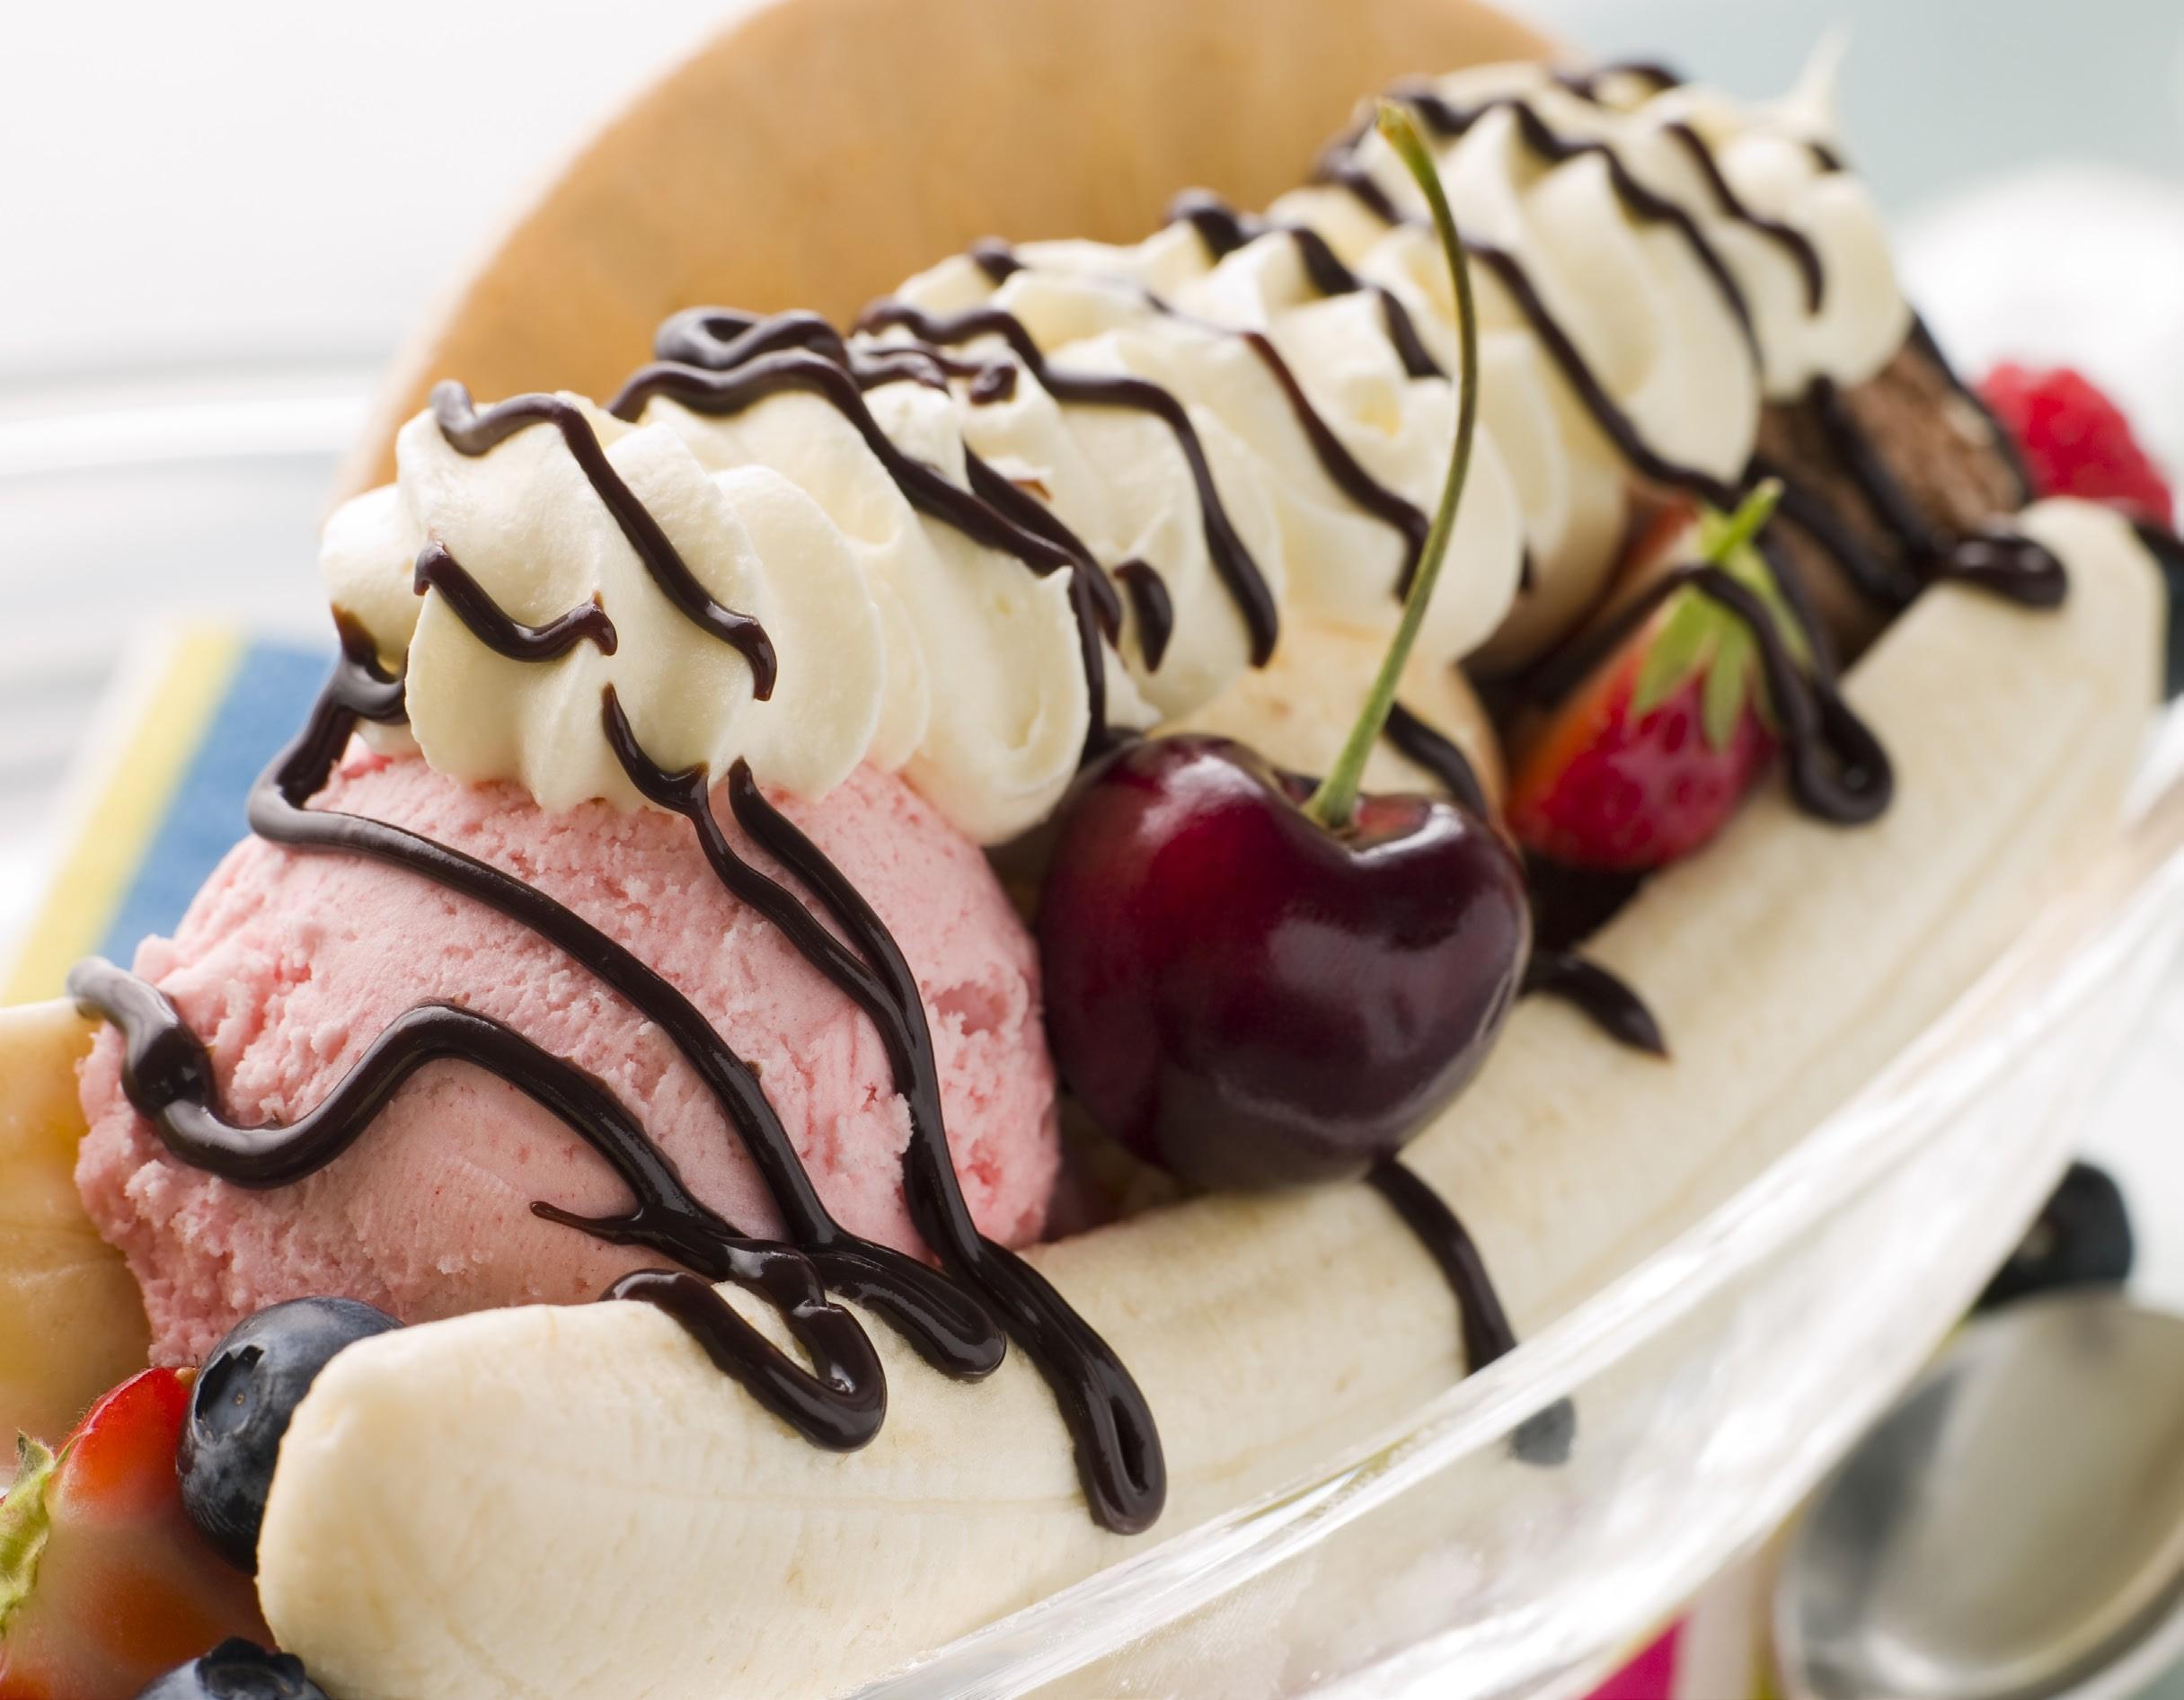 RD冰淇淋加盟 RD冰淇淋加盟多少钱 RD冰淇淋连锁加盟店